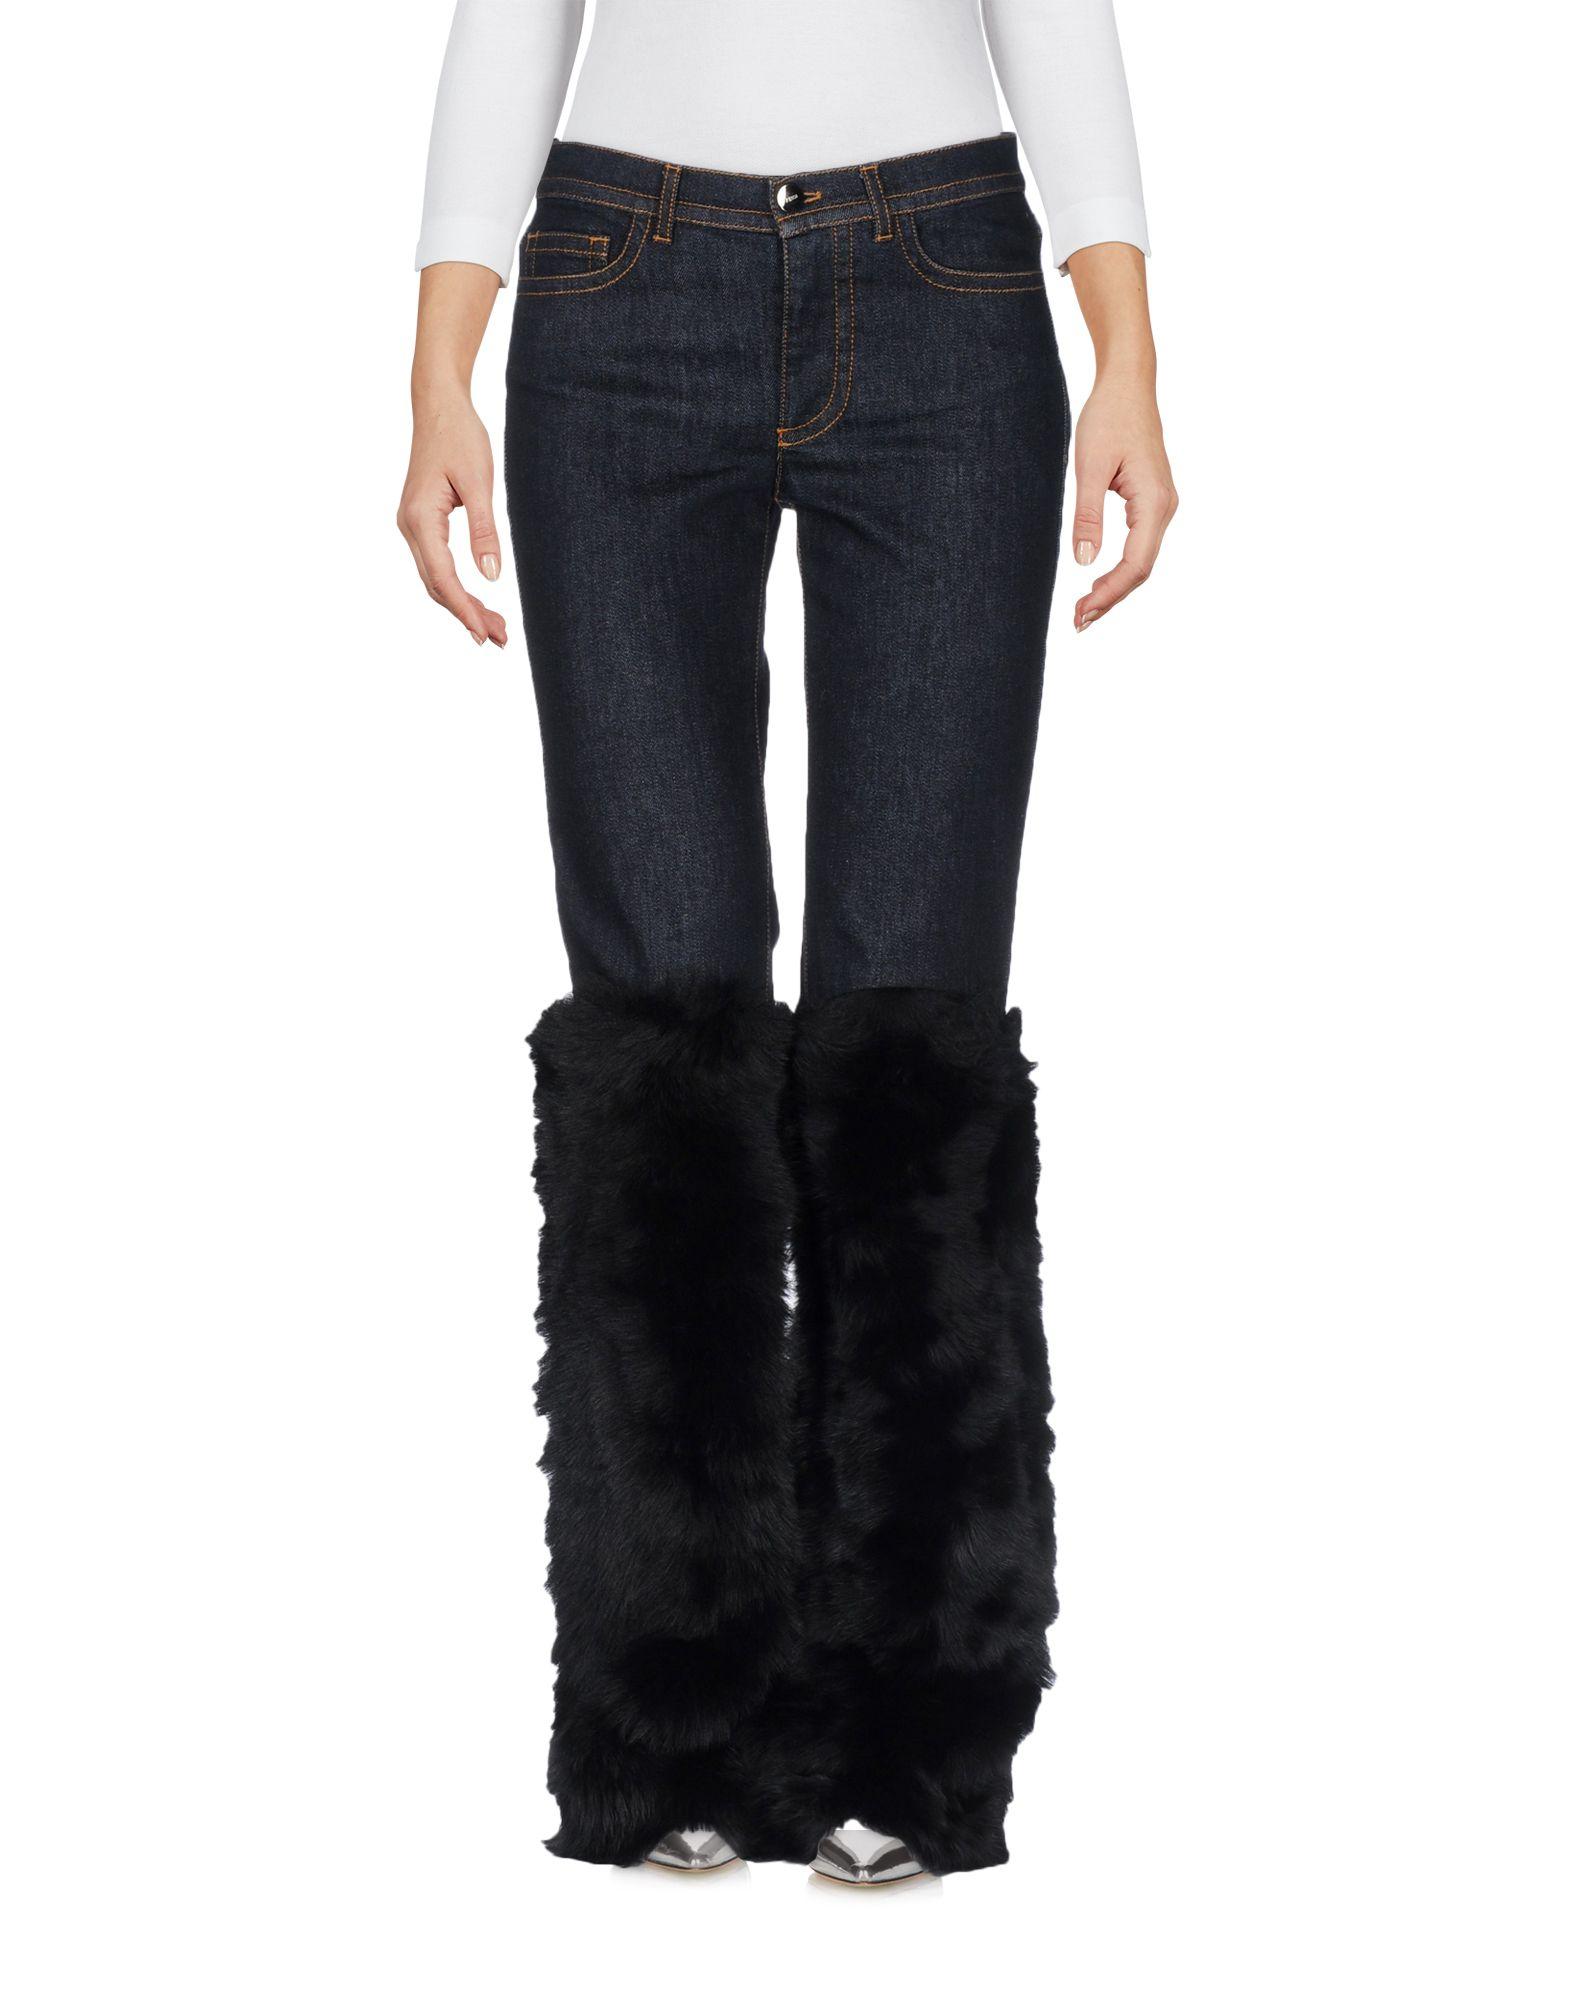 Pantaloni Jeans Fendi Donna - Acquista online su Moj2kE